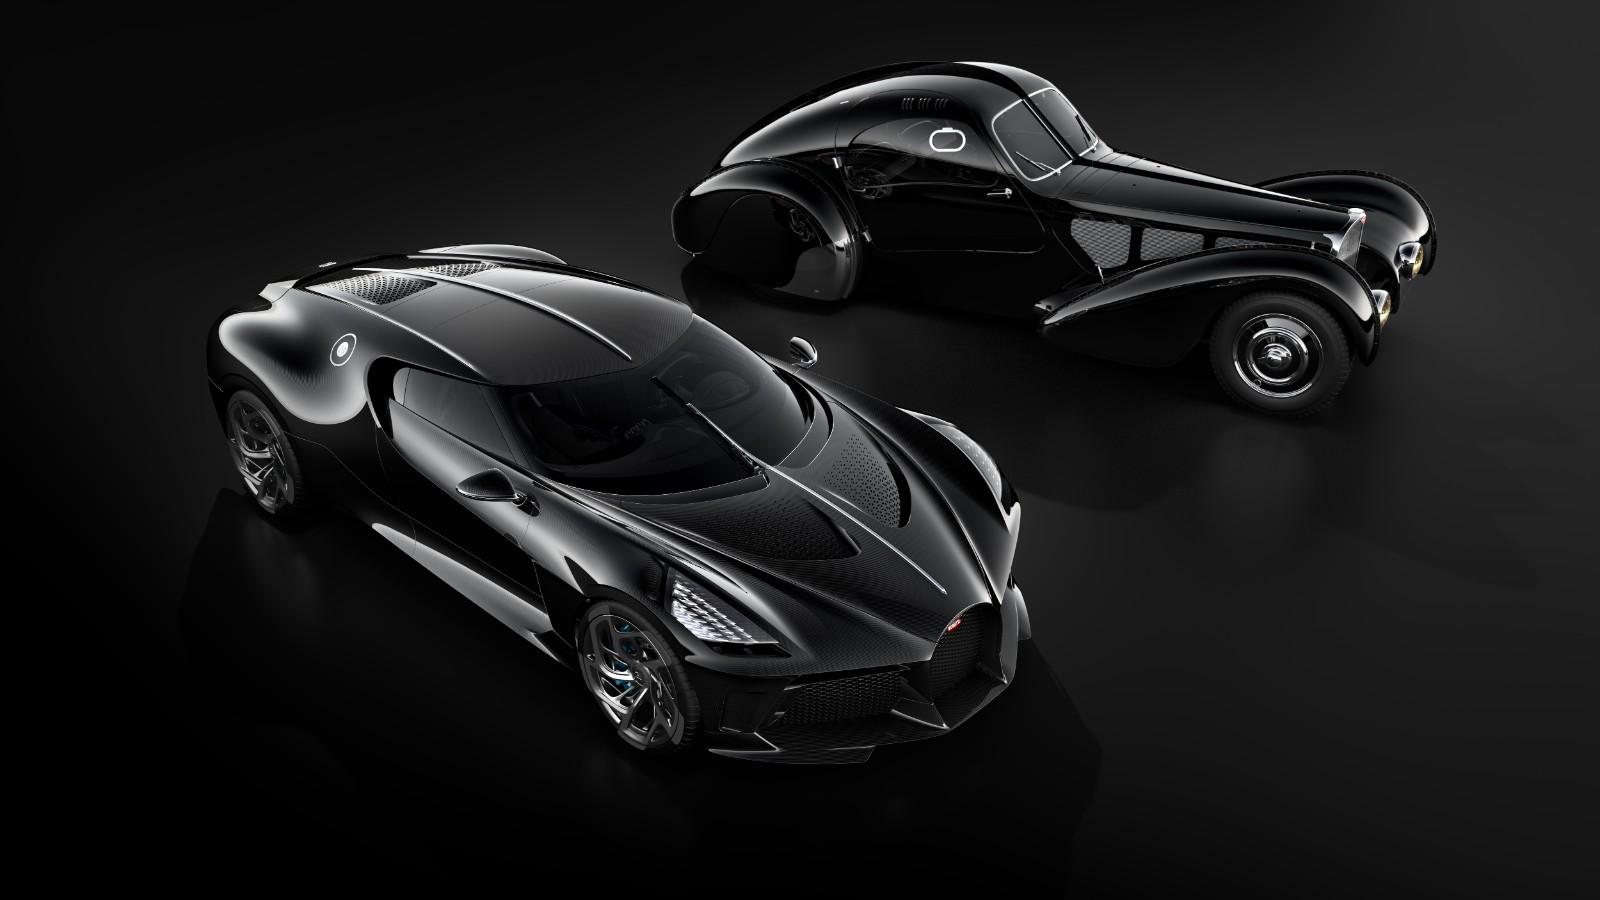 Bugatti Voiture Noire (2)